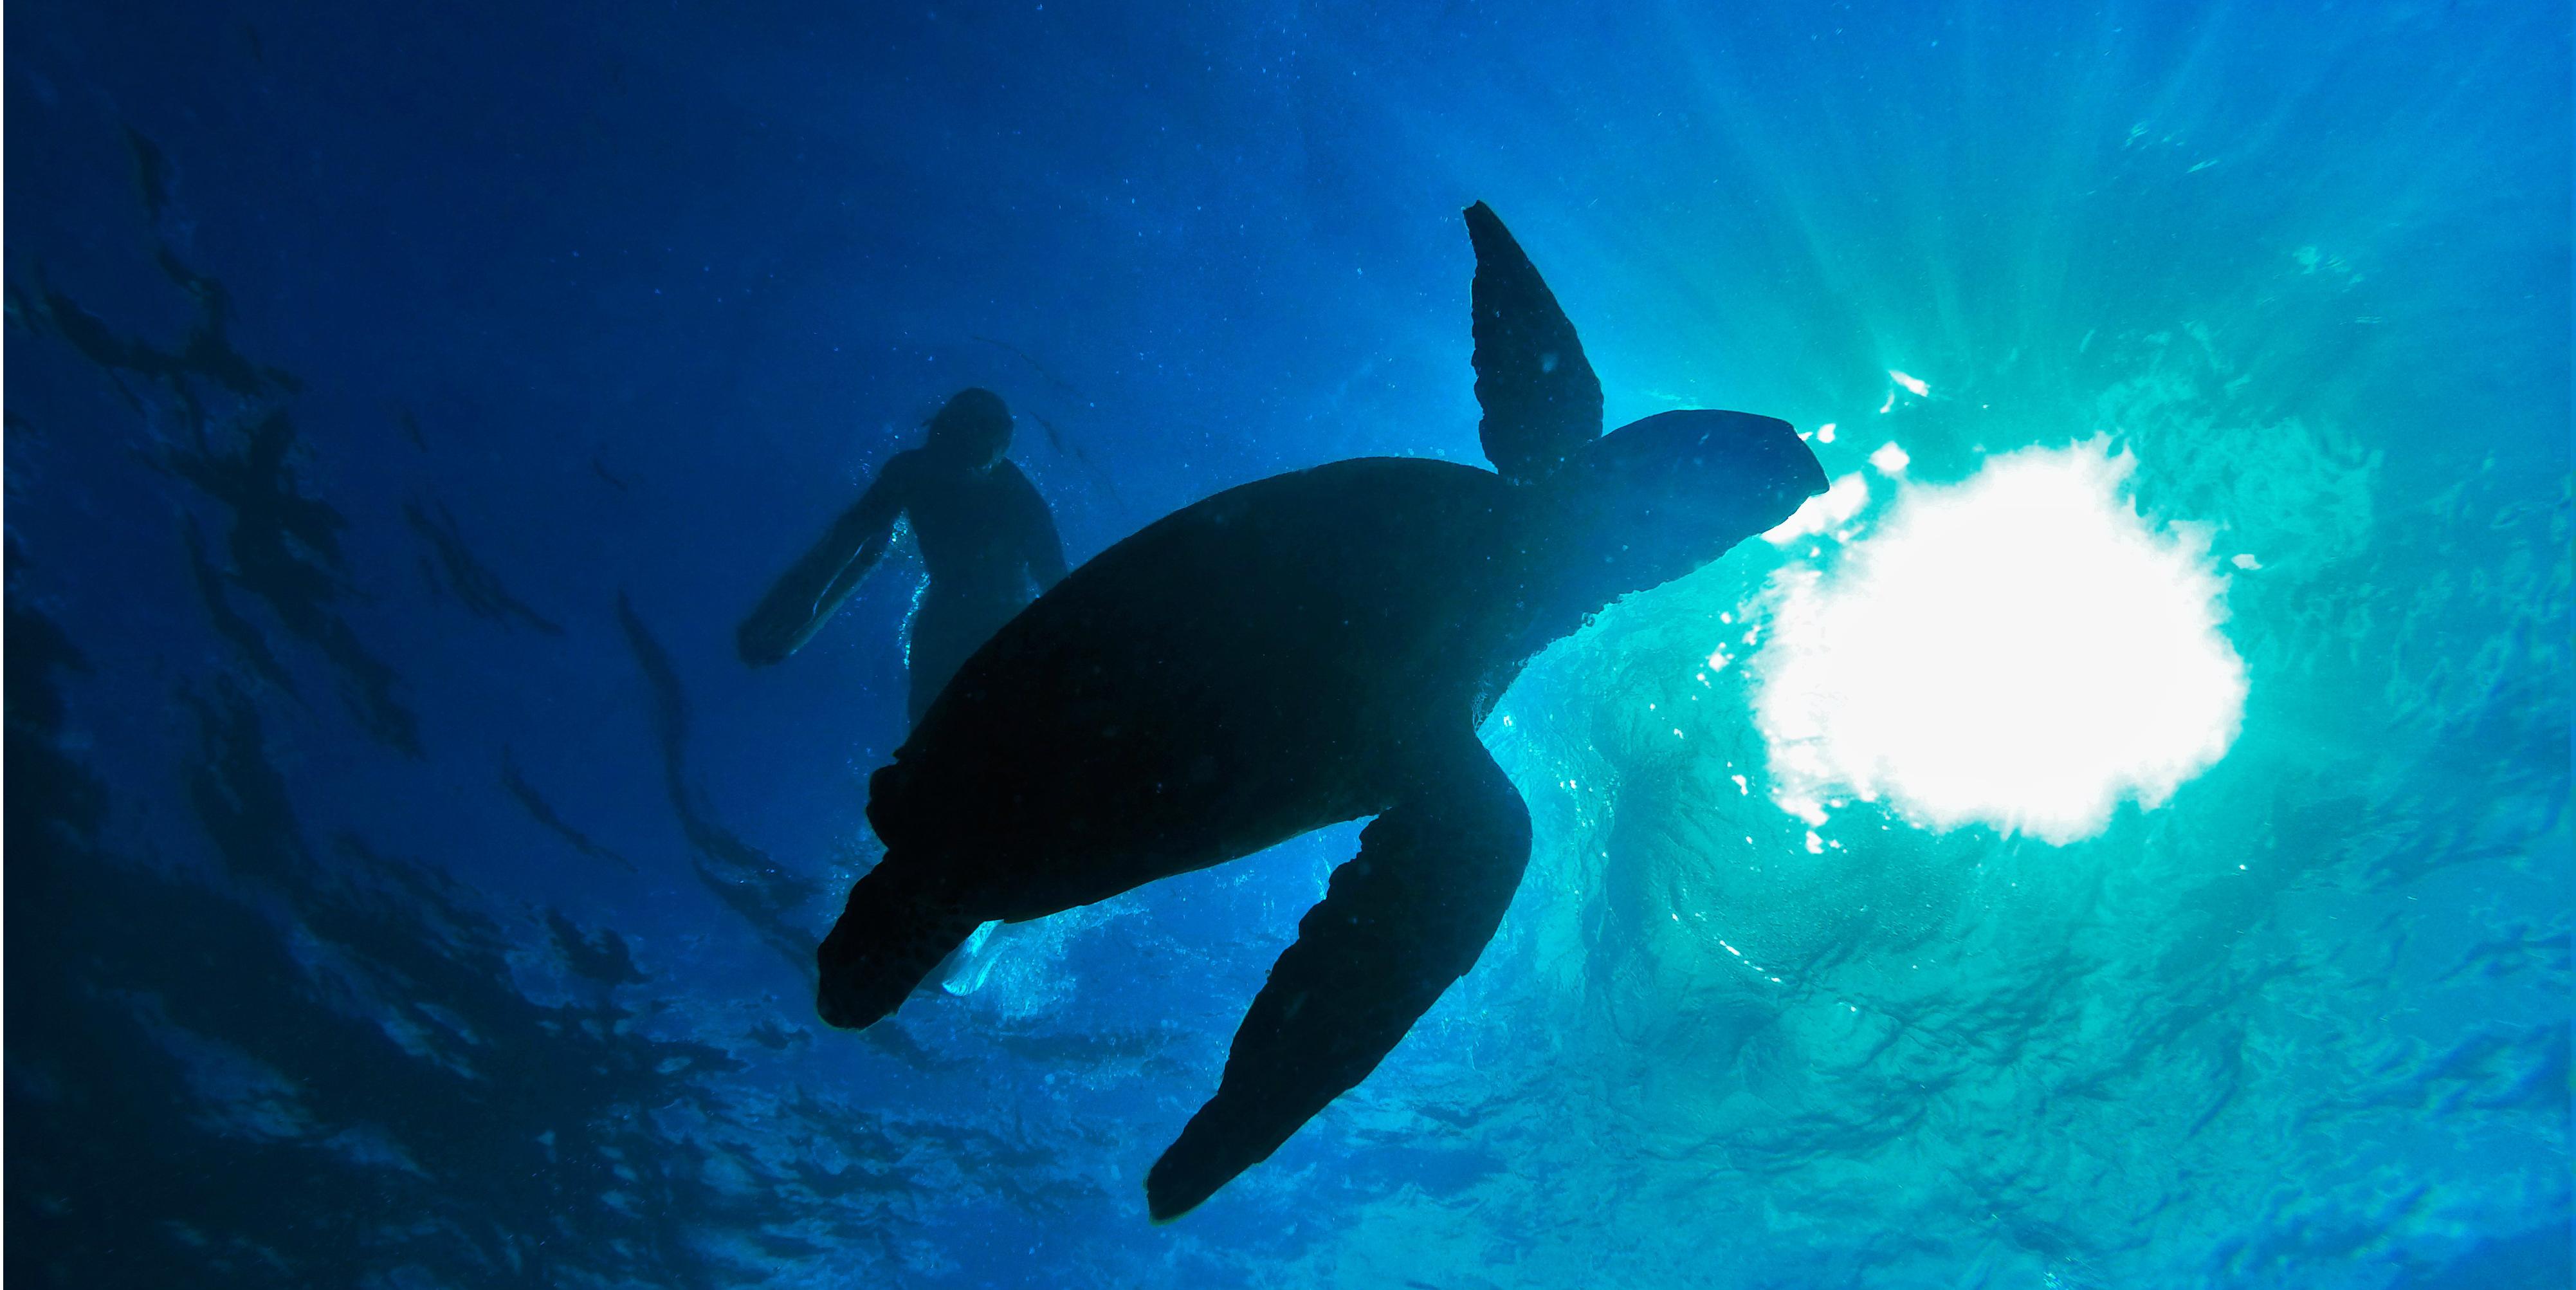 sea turtles endangered